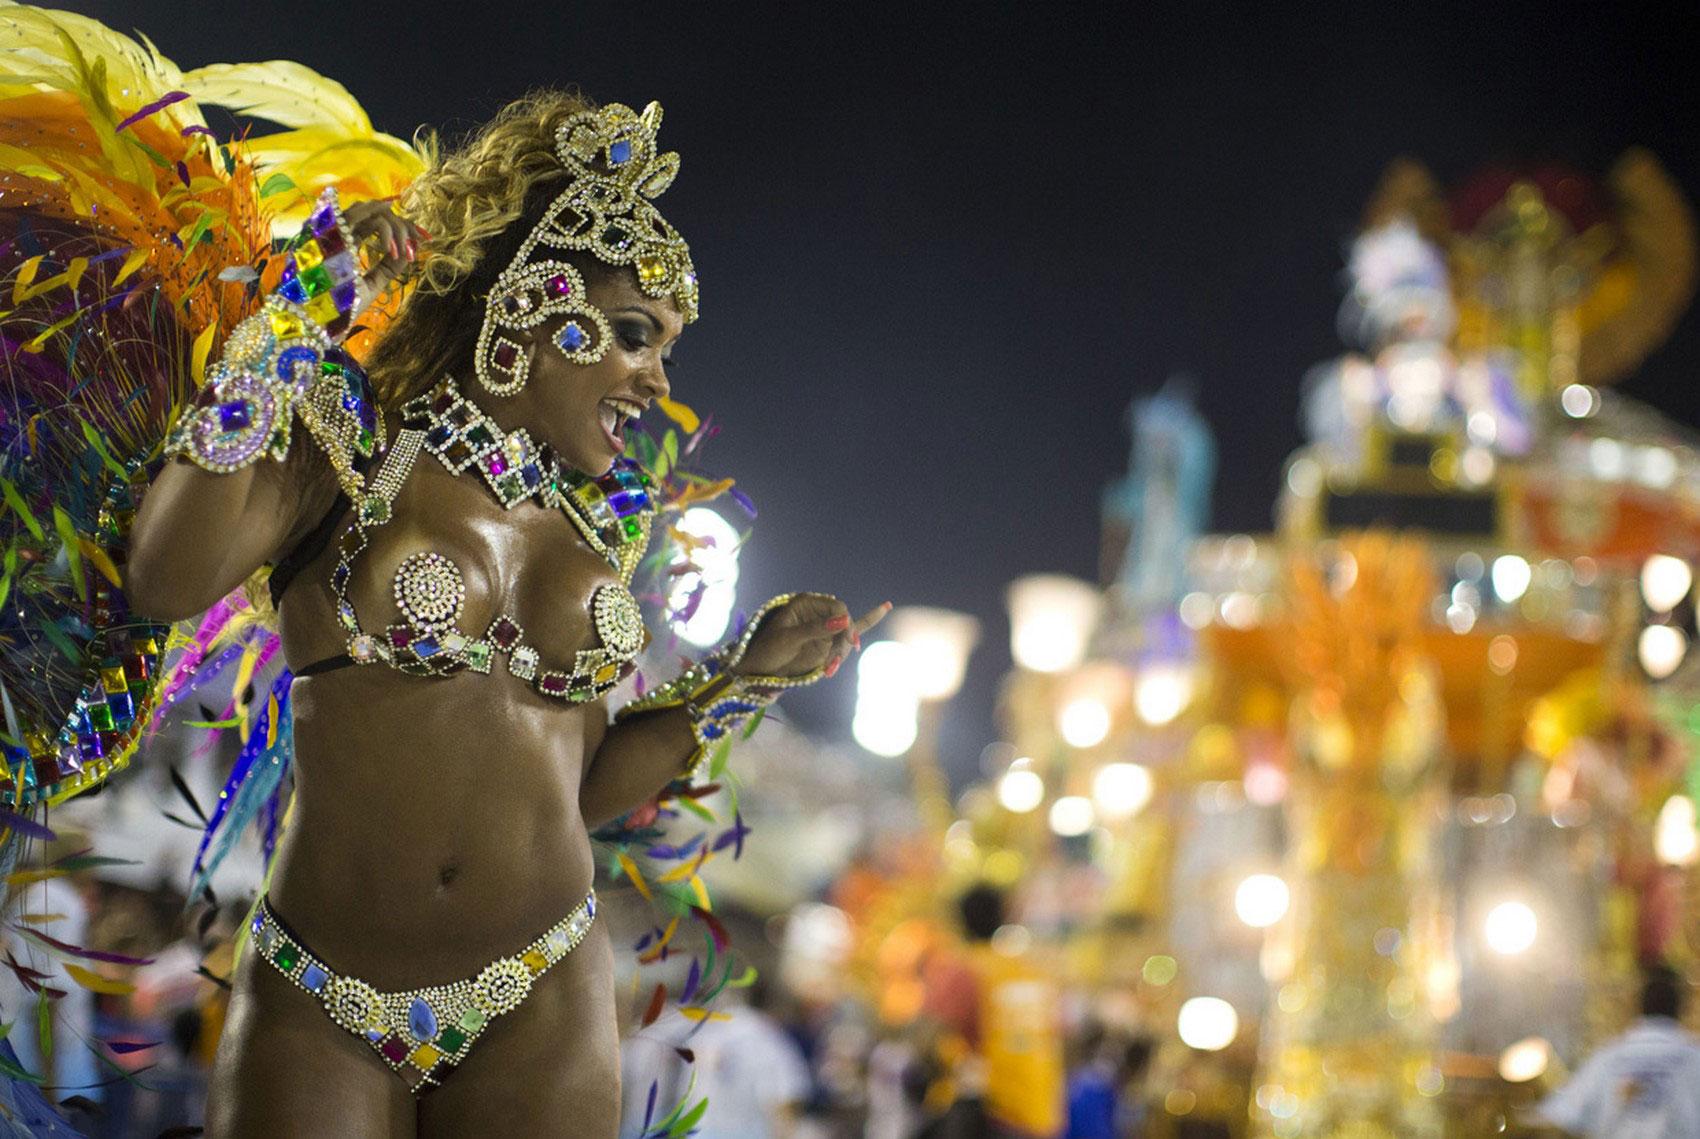 Matures monterrey rio carnival teen black perteens women